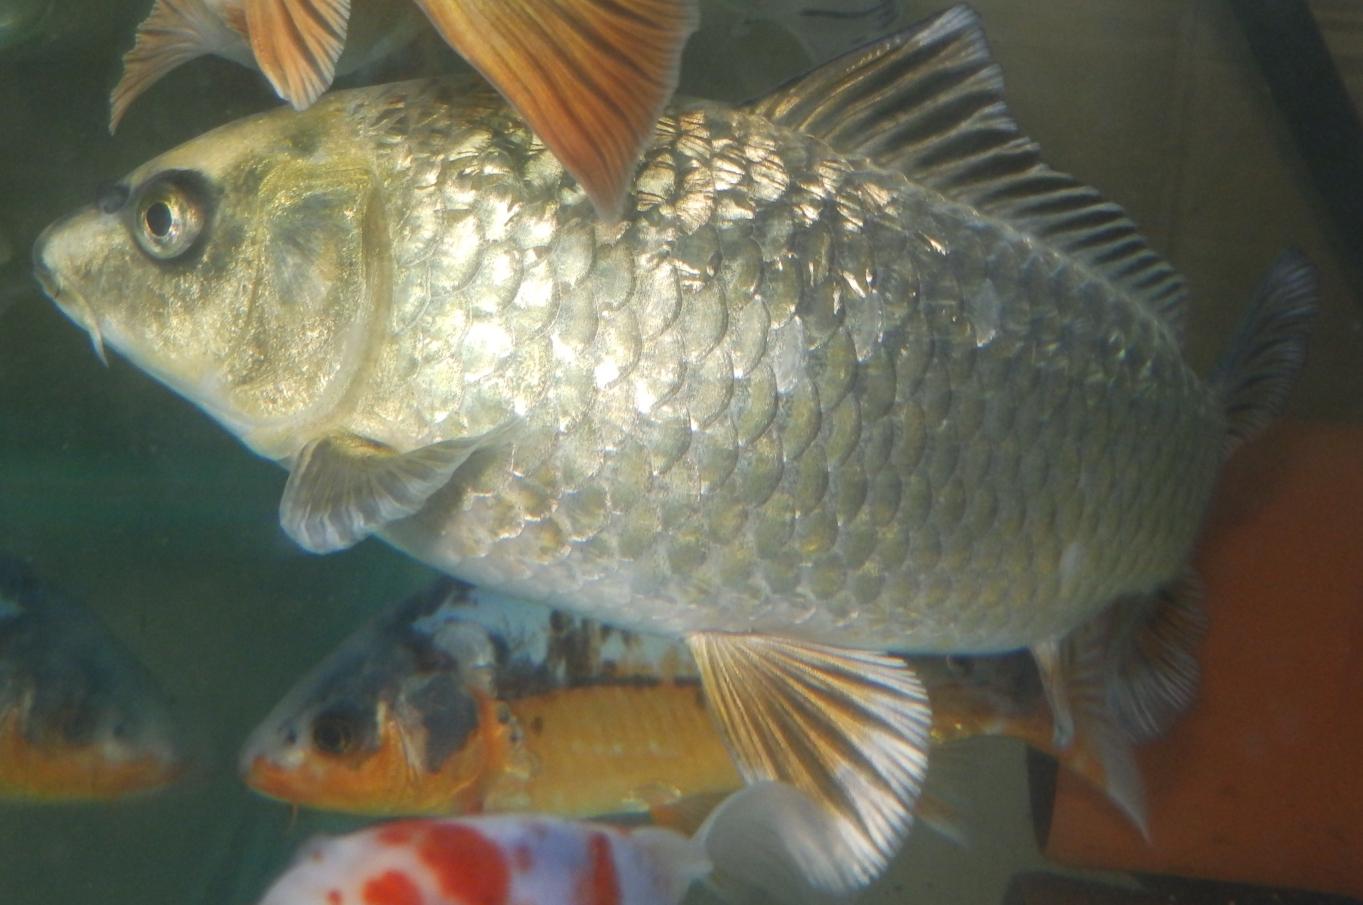 Reptiles amphibians fish gin rin ghost koi for Ghost koi fish